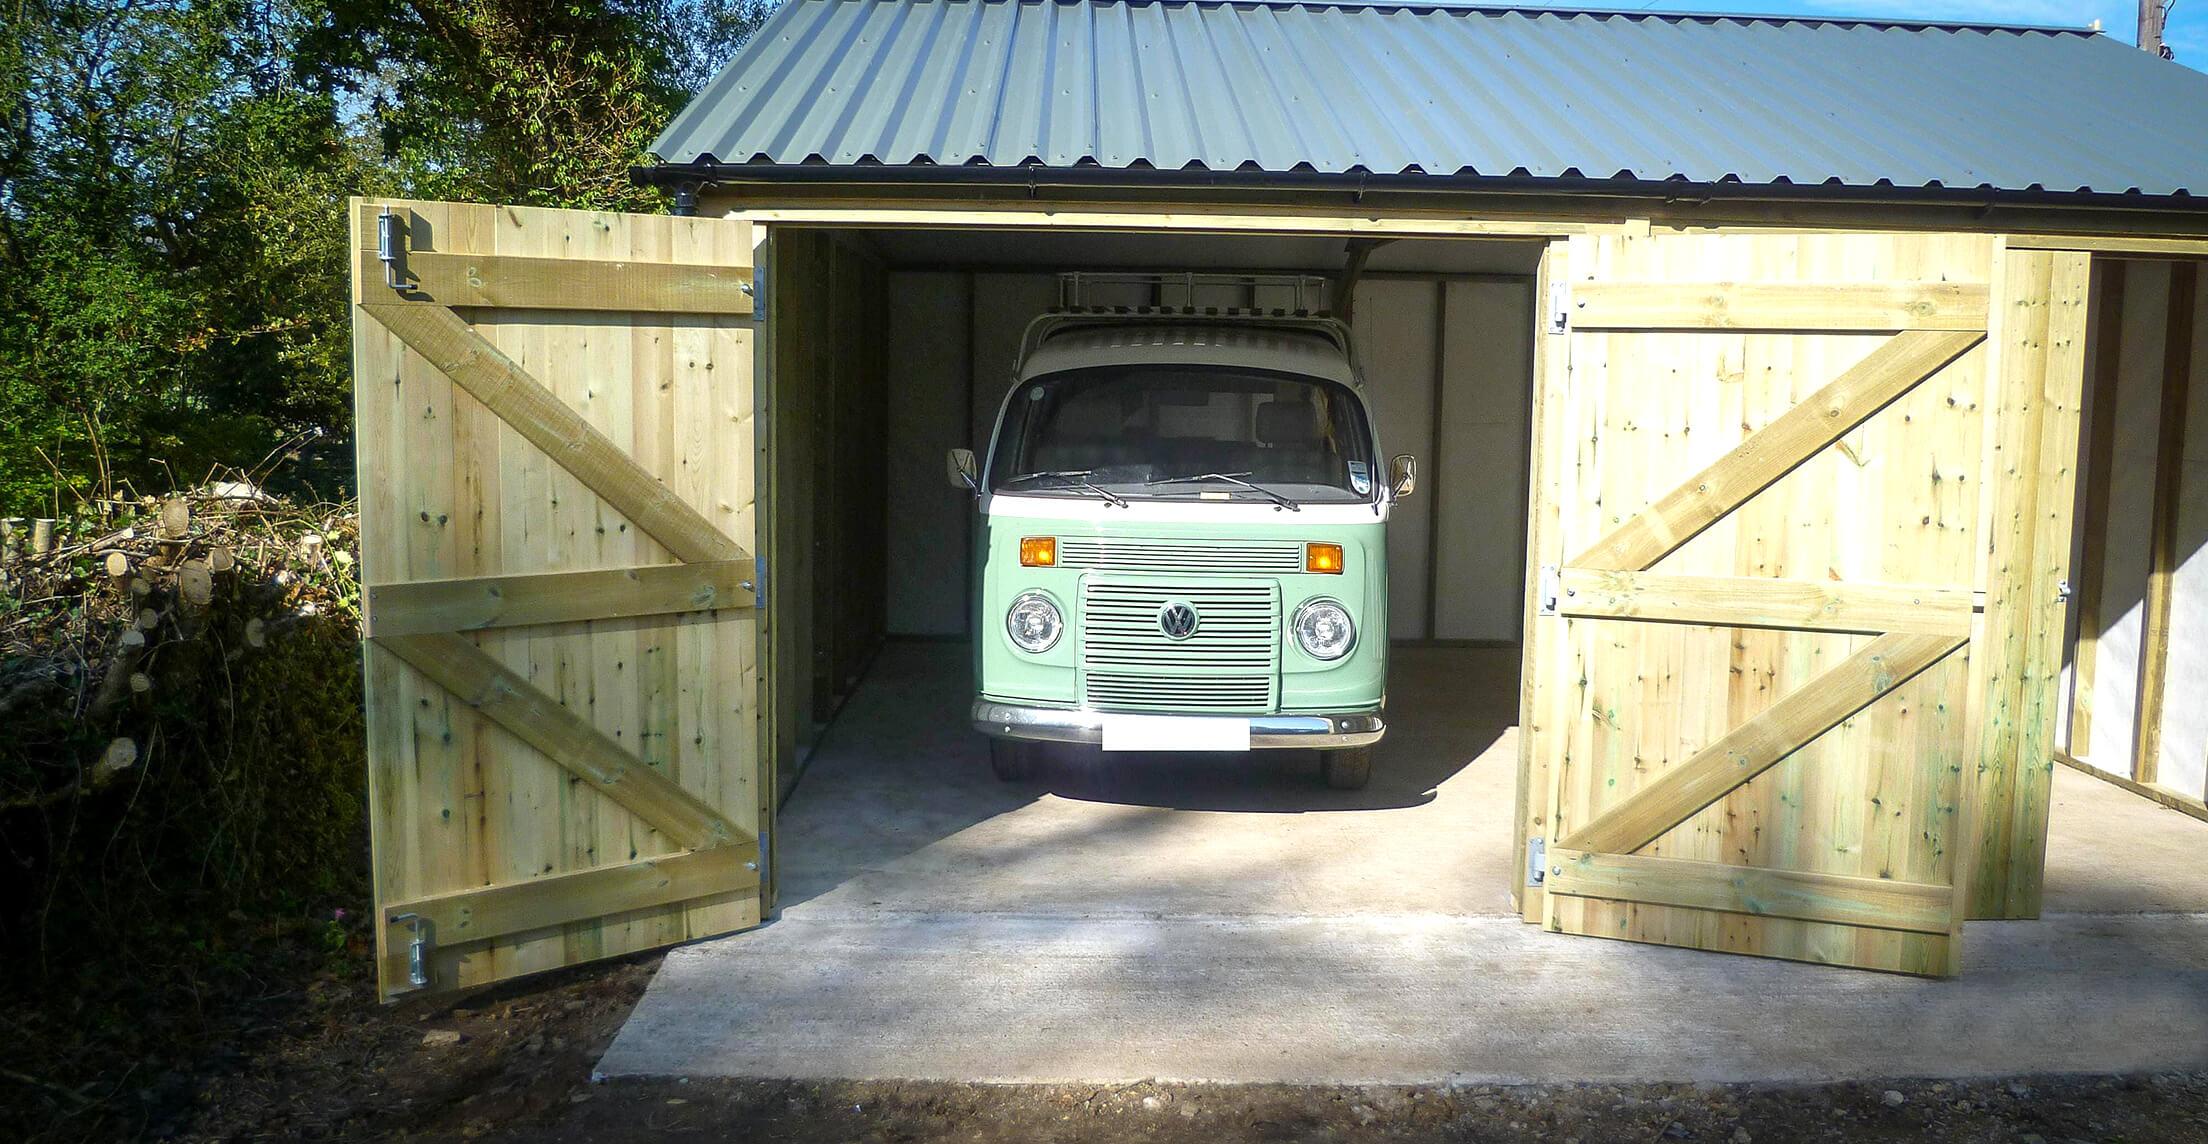 Extra height for camper van